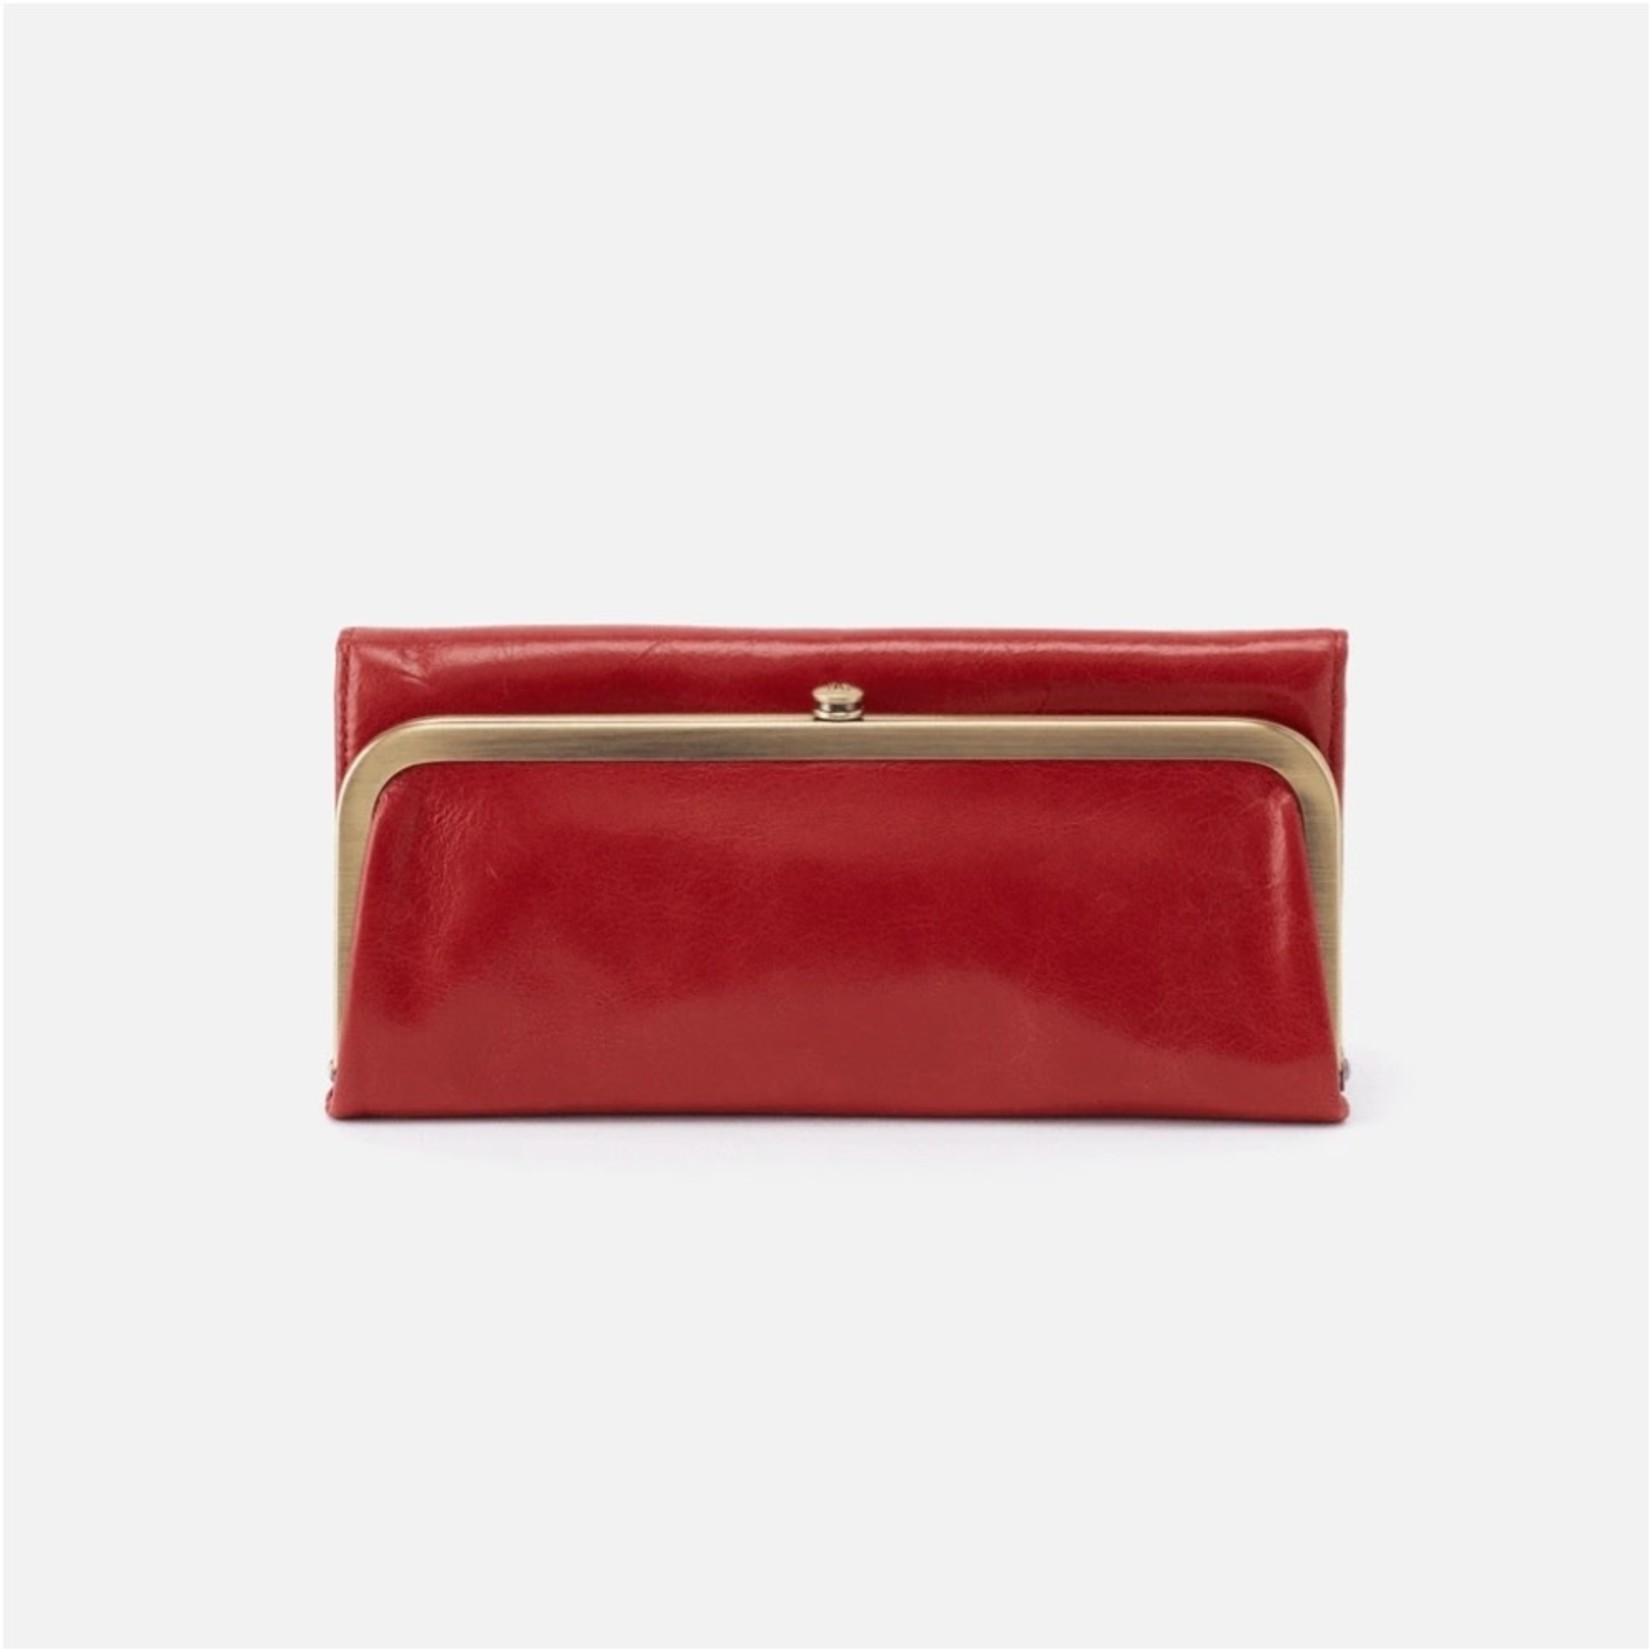 HOBO Rachel Brick Vintage Leather Foldover Wallet